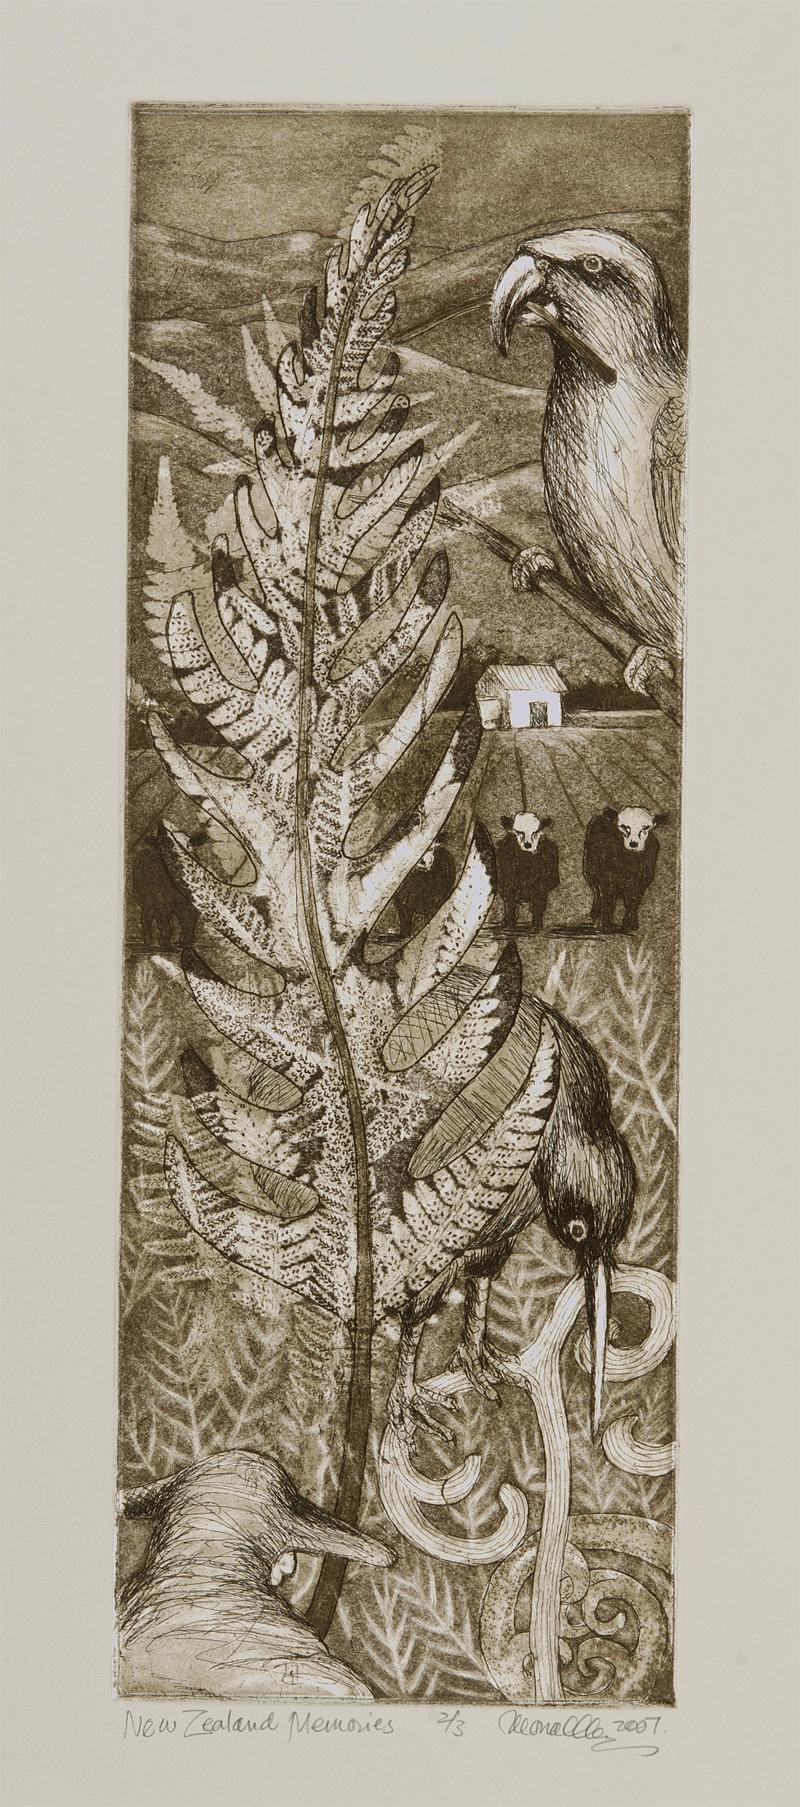 "New Zealand Memories Etchin & Aquatint | 6x18"""